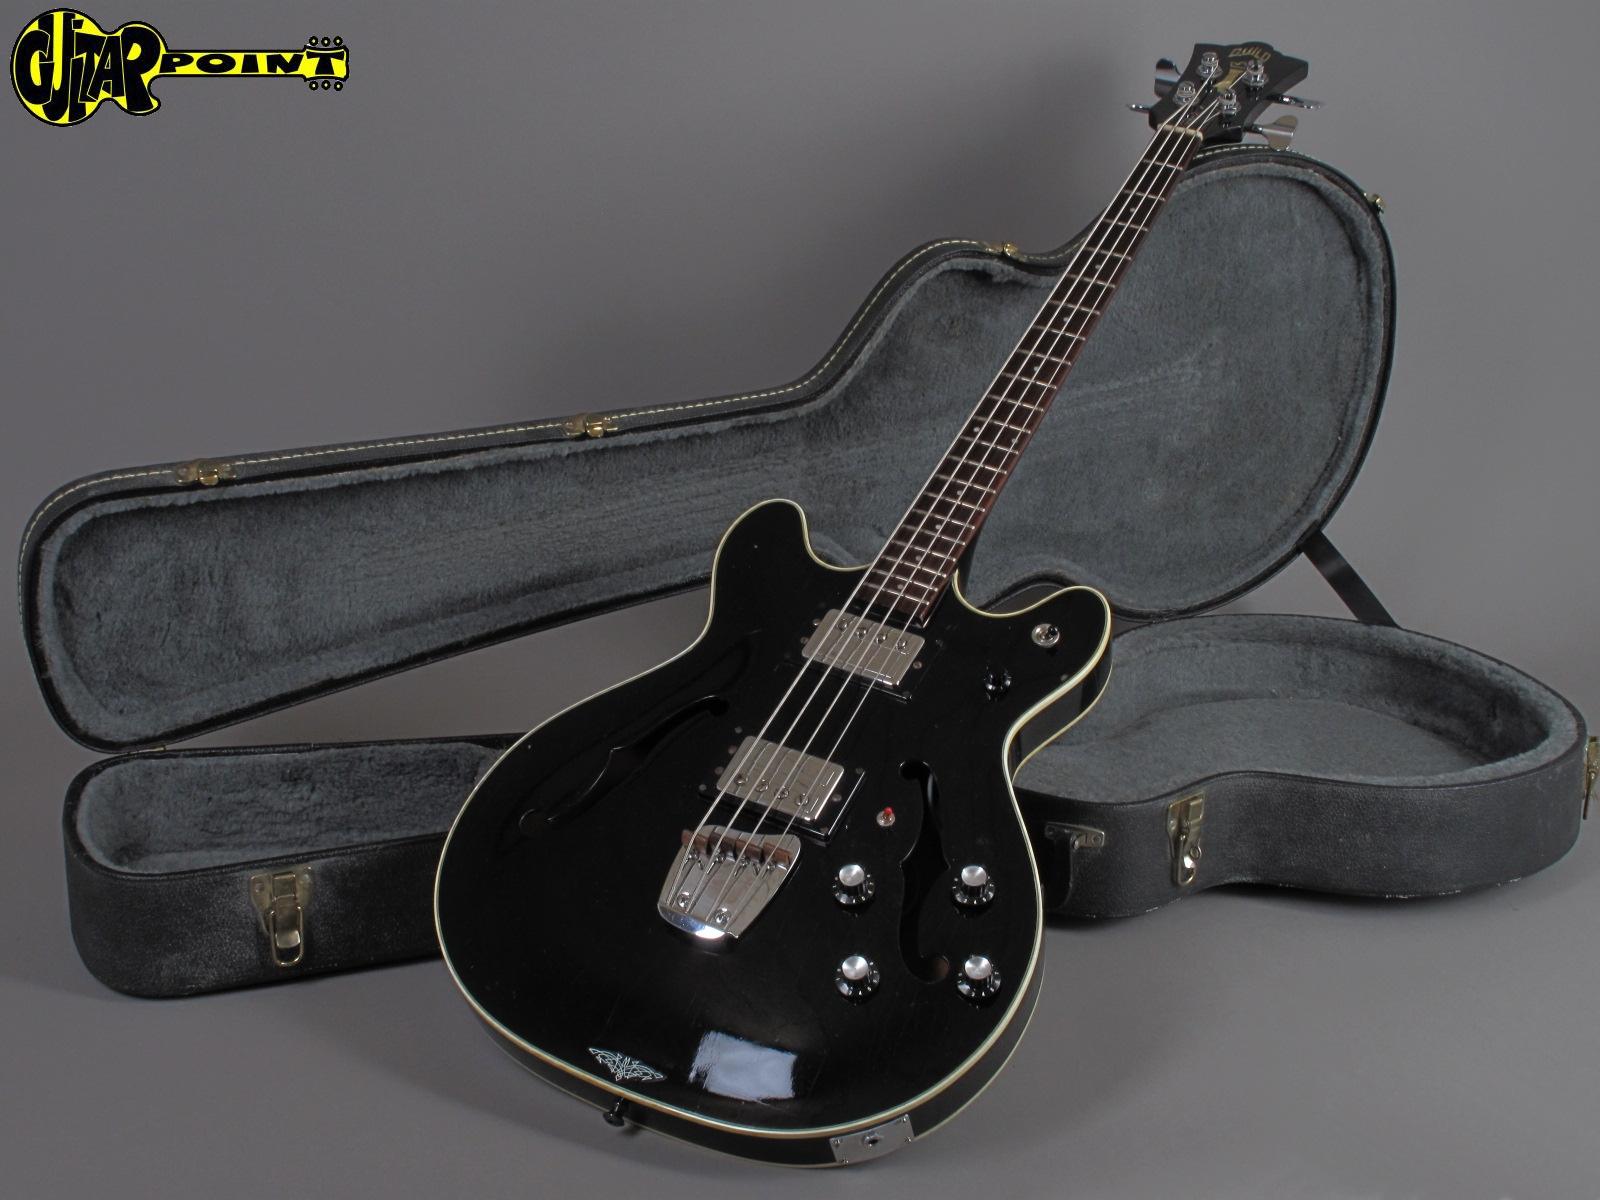 https://guitarpoint.de/app/uploads/products/1976-guild-starfire-sf-bass-ii-black/Guild76SFBassBlk148990_16.jpg